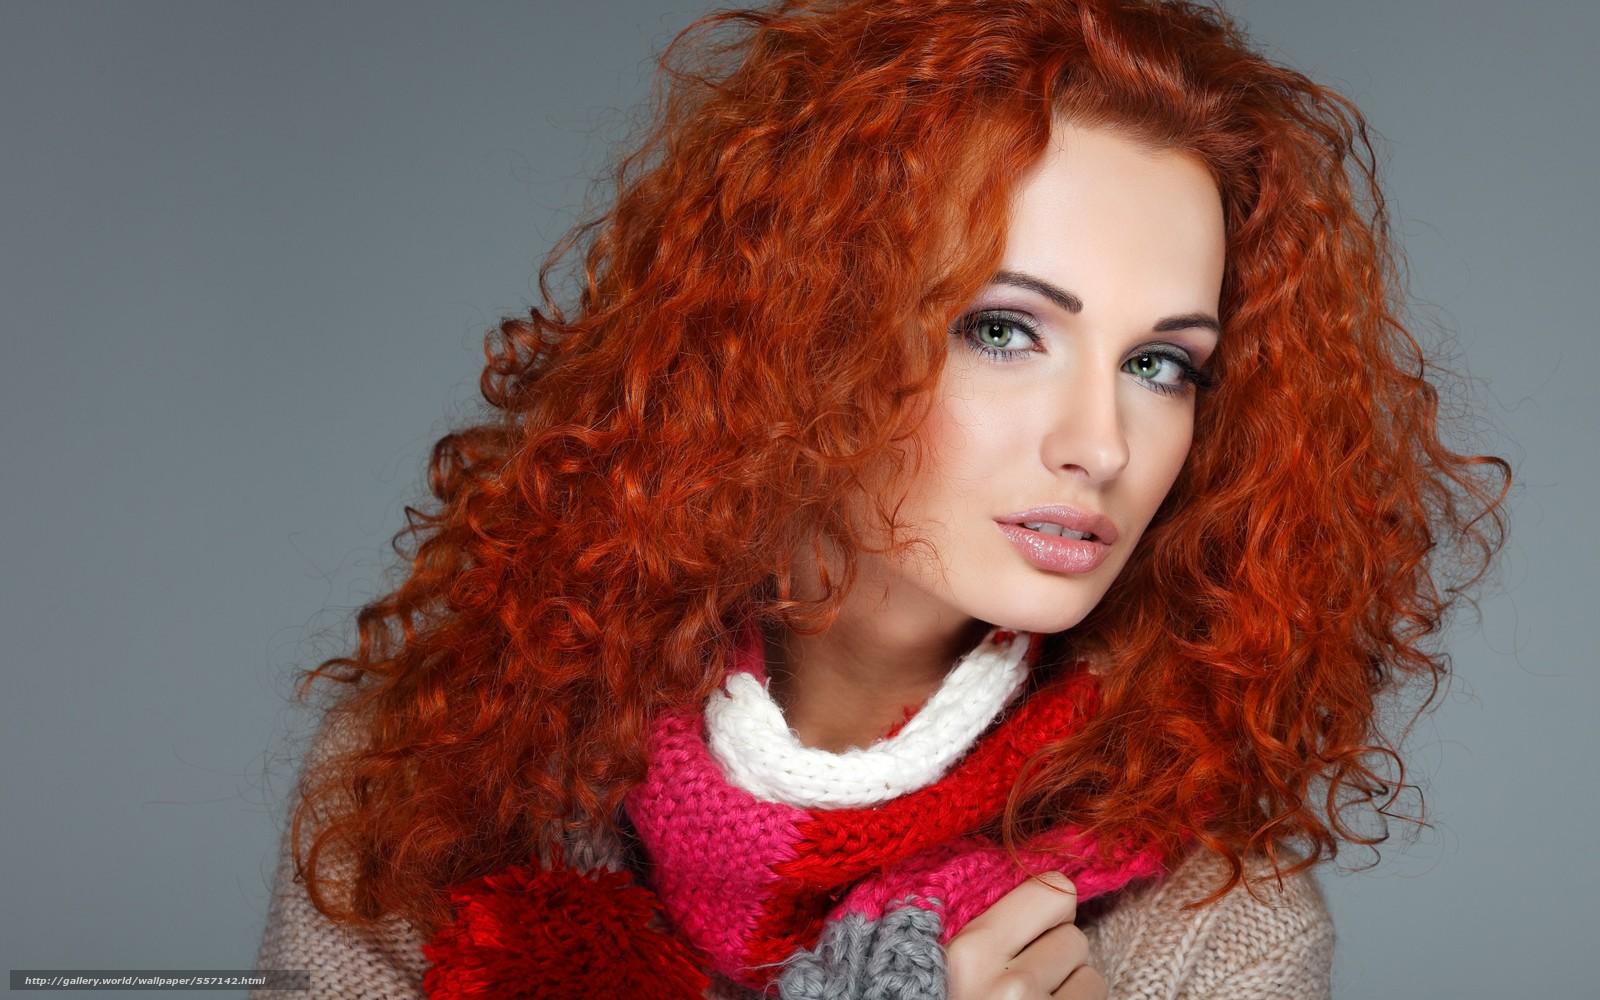 people, girl, redhear, redhead, beauty